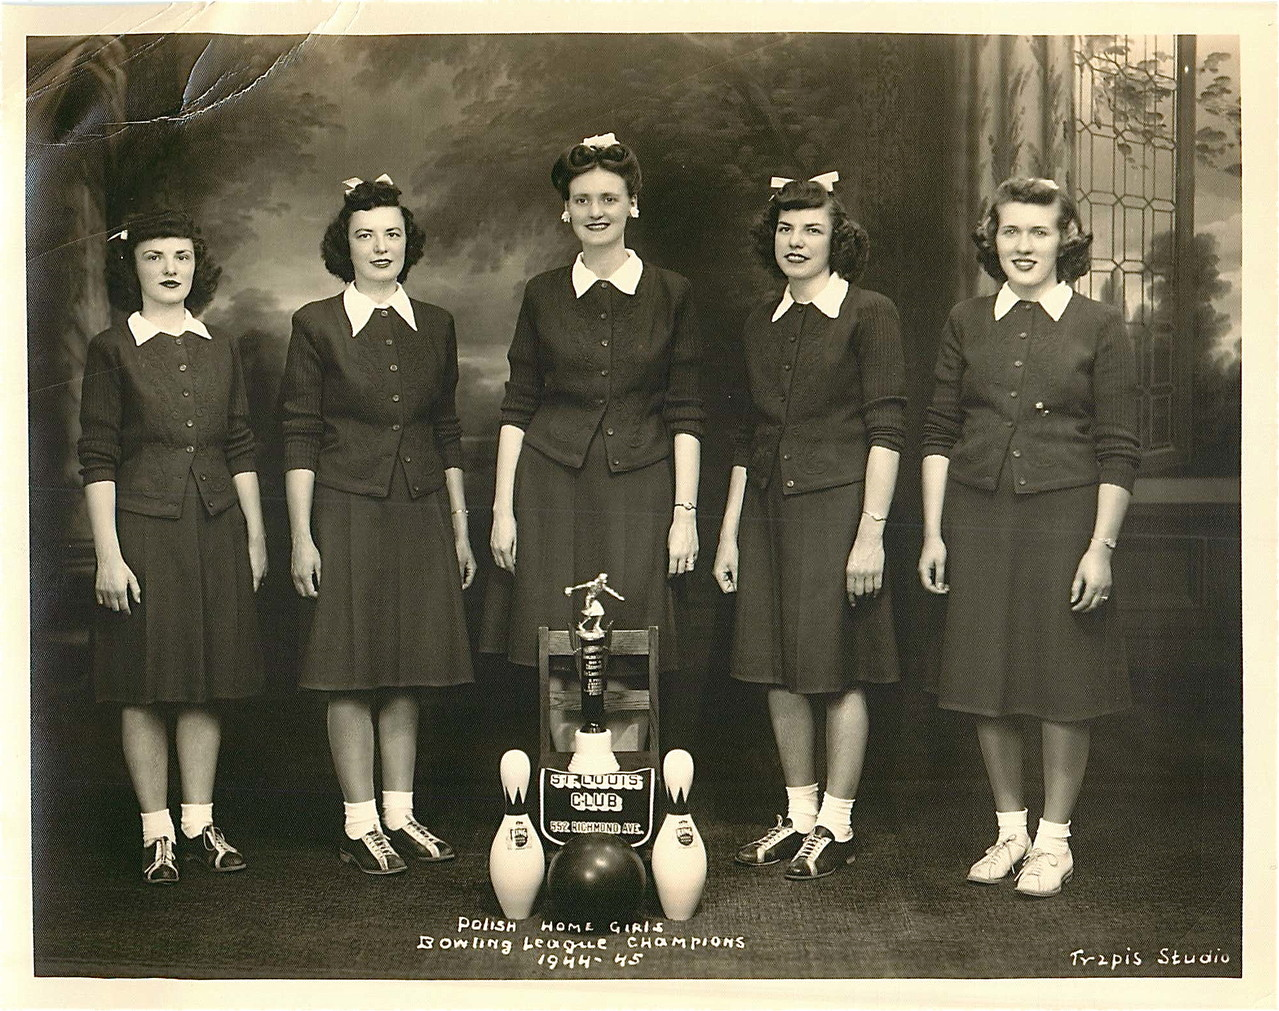 Eleanor Bogden Gudas, 1944, Polish Home Girls League Team Champions